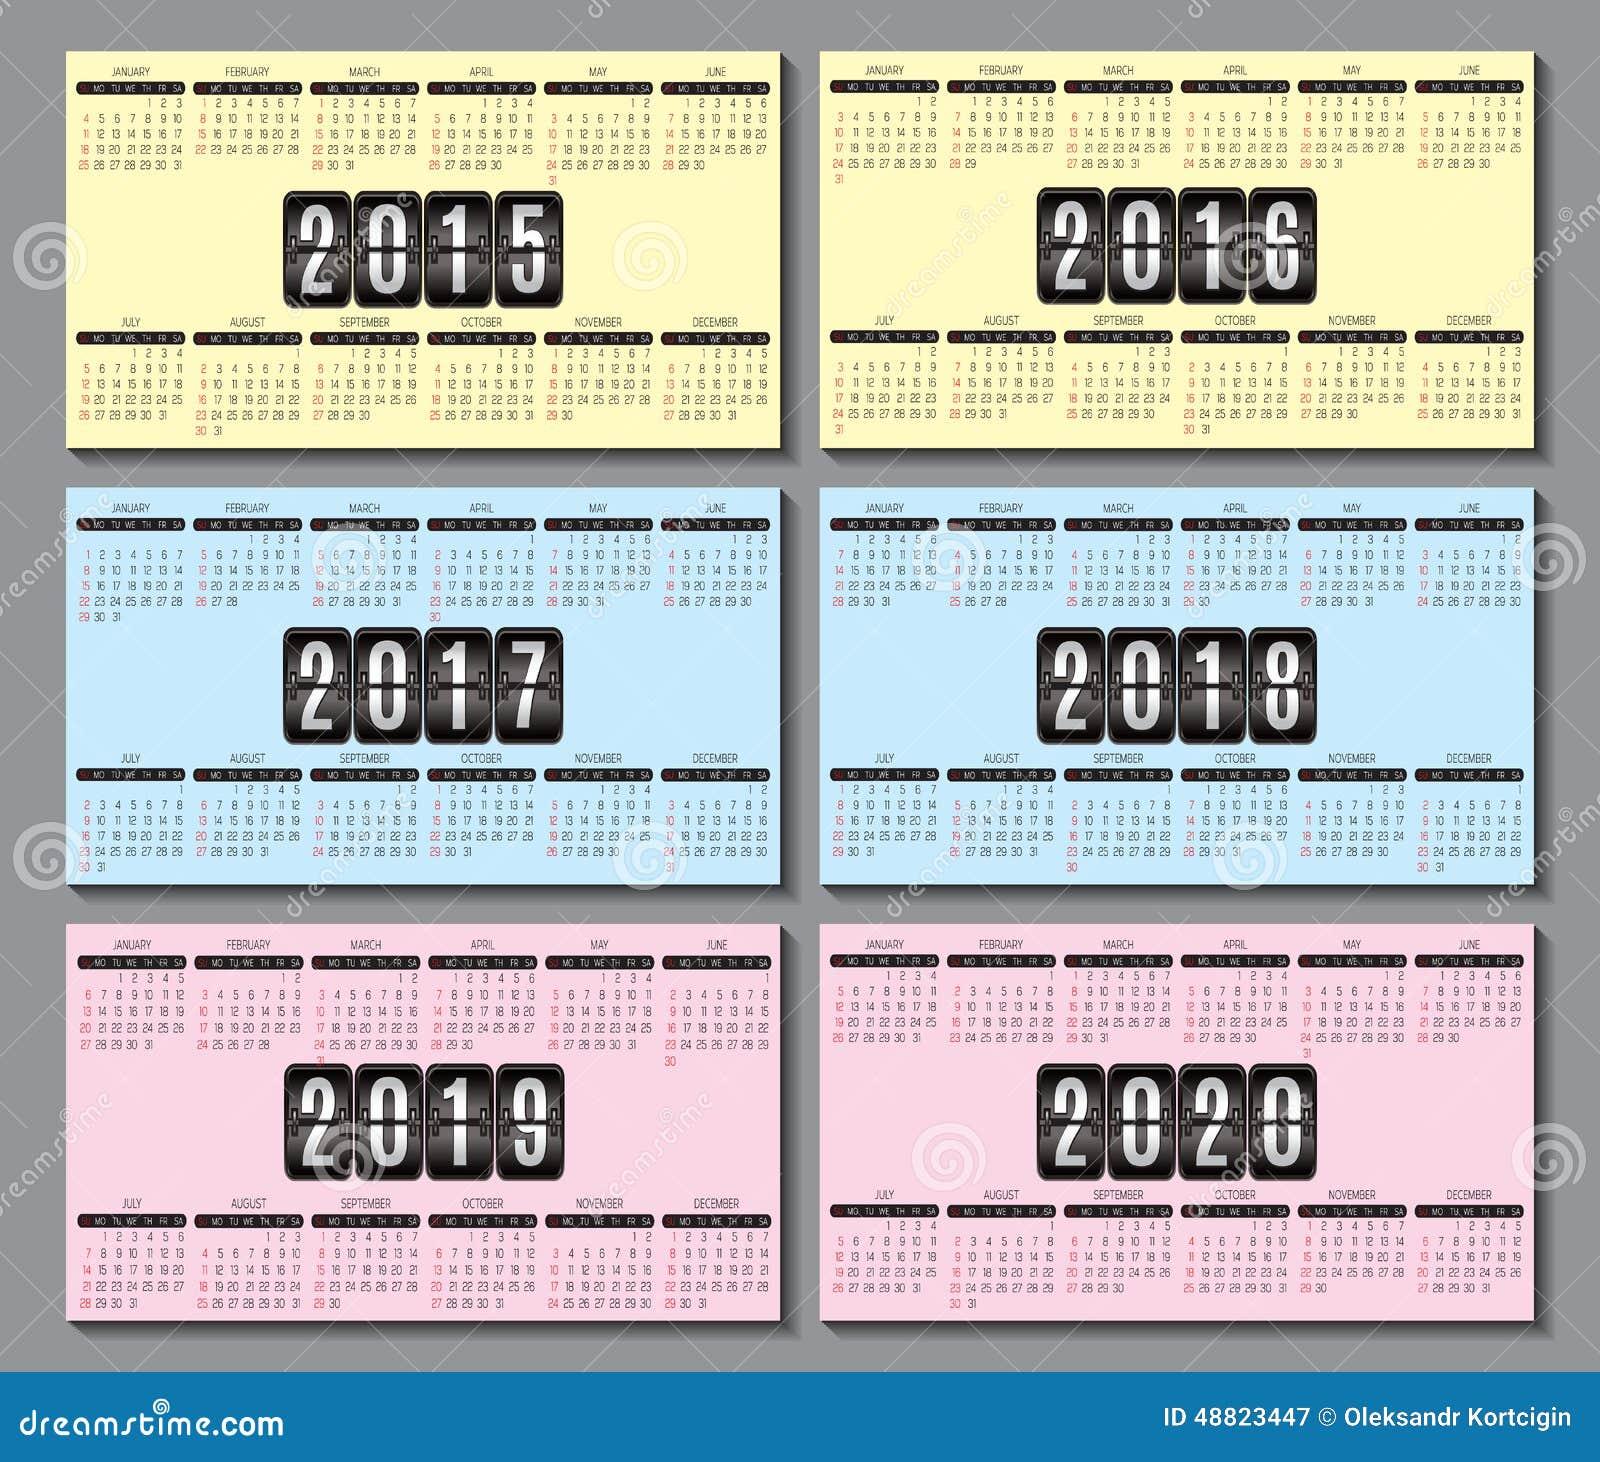 Calendar Grid 2015 2016 2020 For Business Card Stock Vector